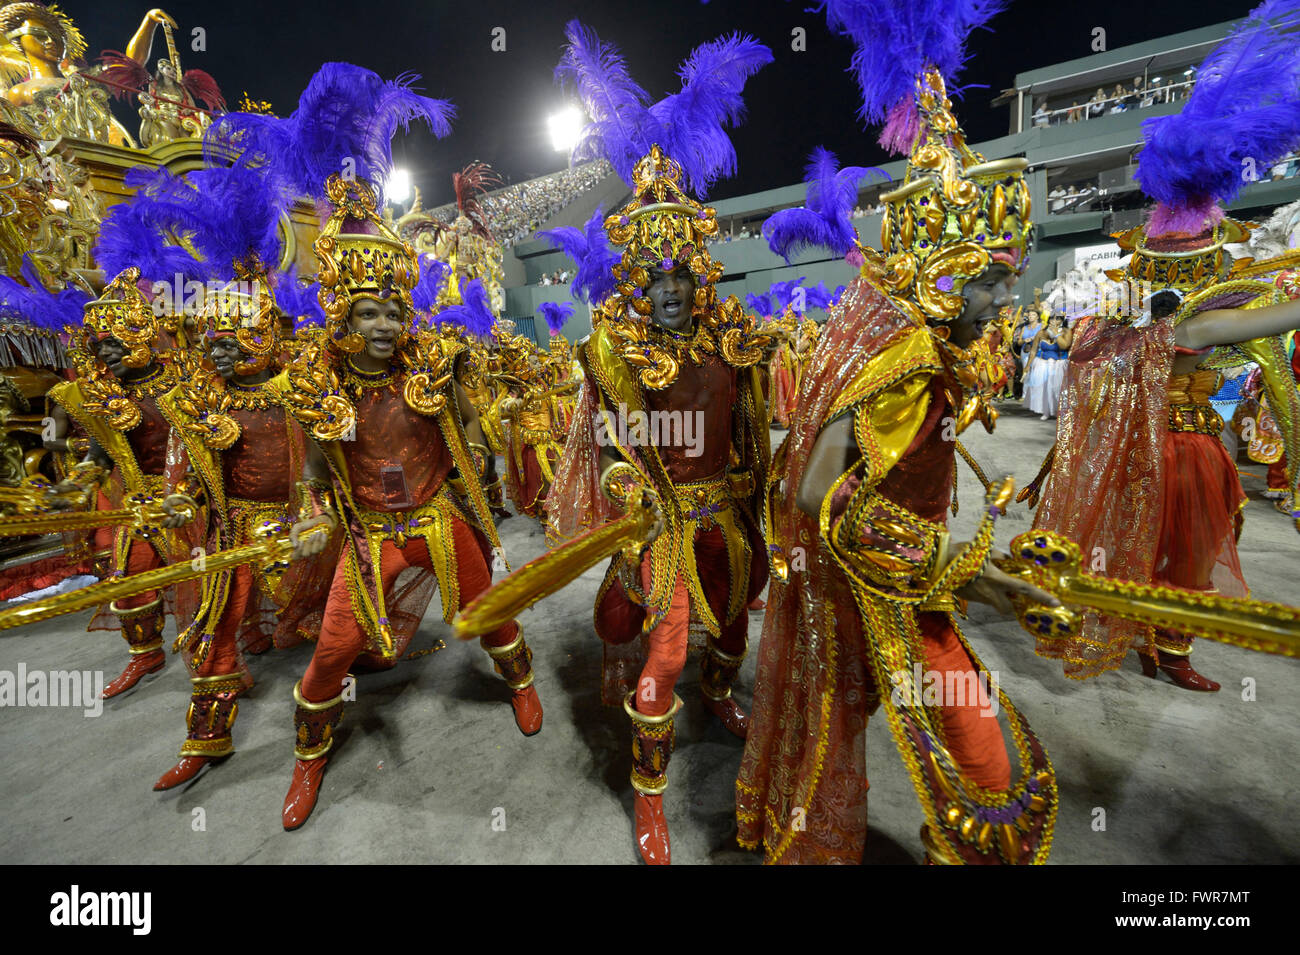 Samba dancers in costume as Roman soldiers, parade of the samba school Beija Flor de Nilópolis, Sambodromo, - Stock Image